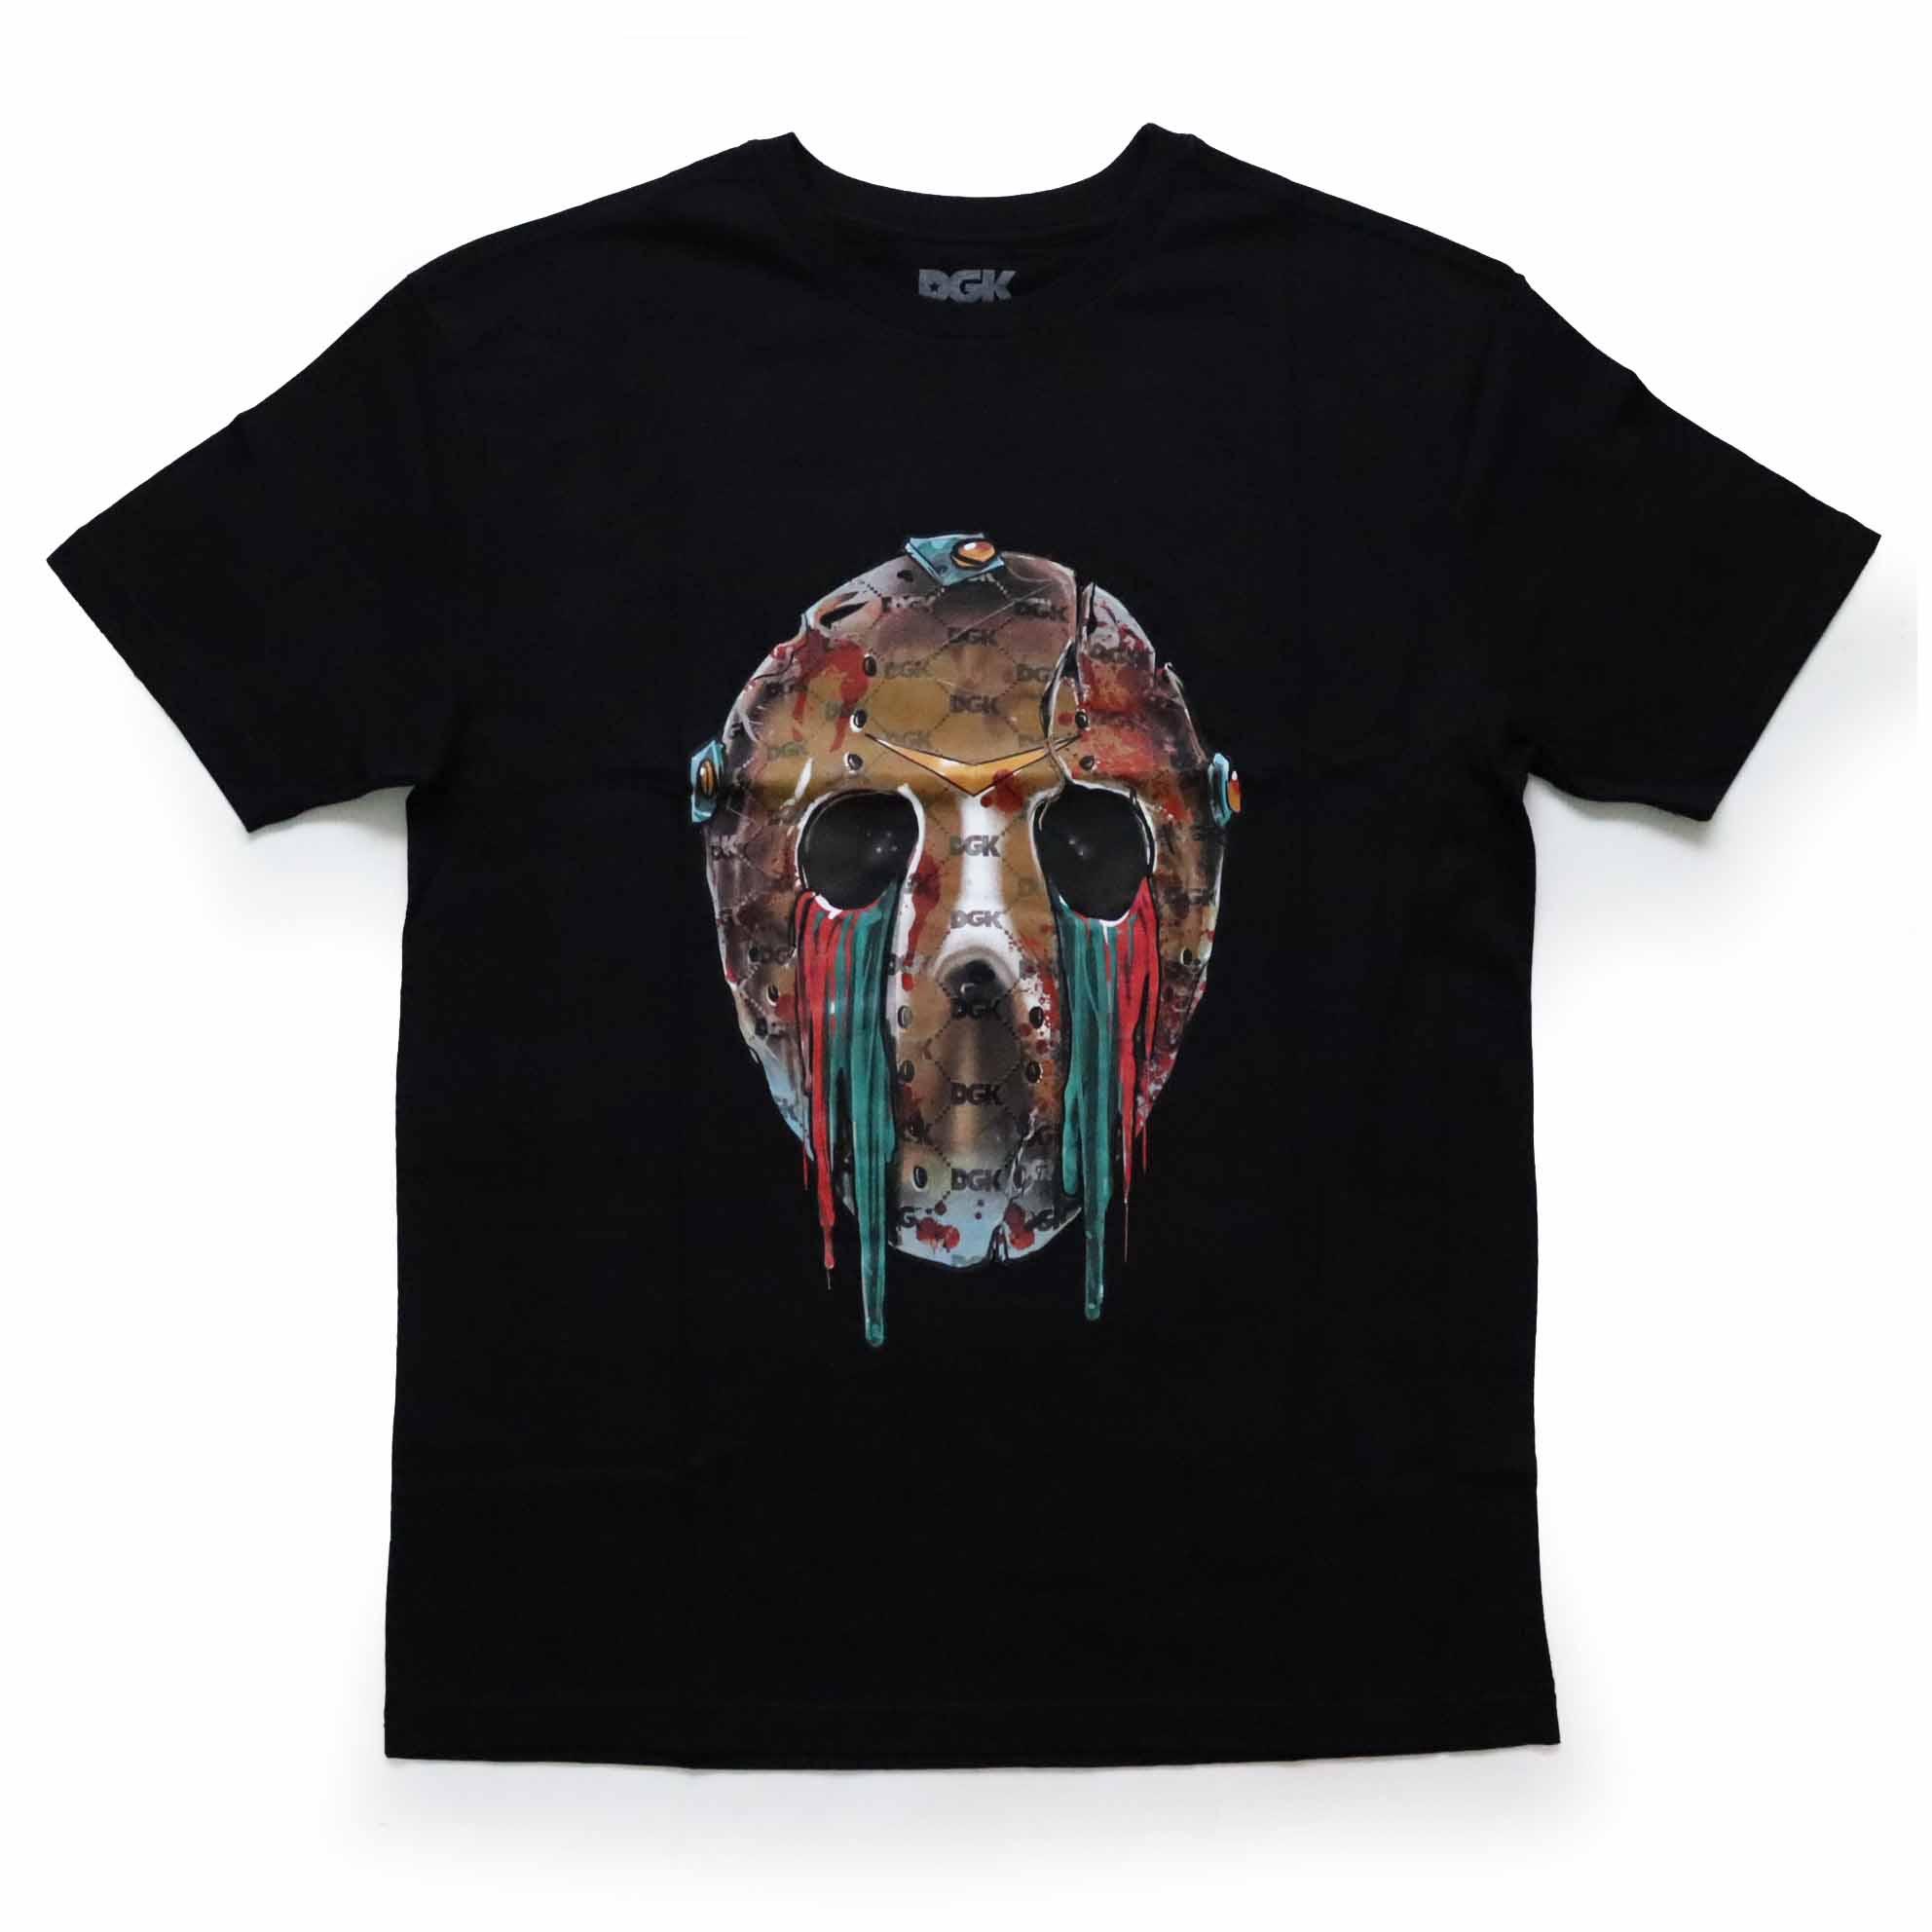 Camiseta DGK Hooligan - Preto